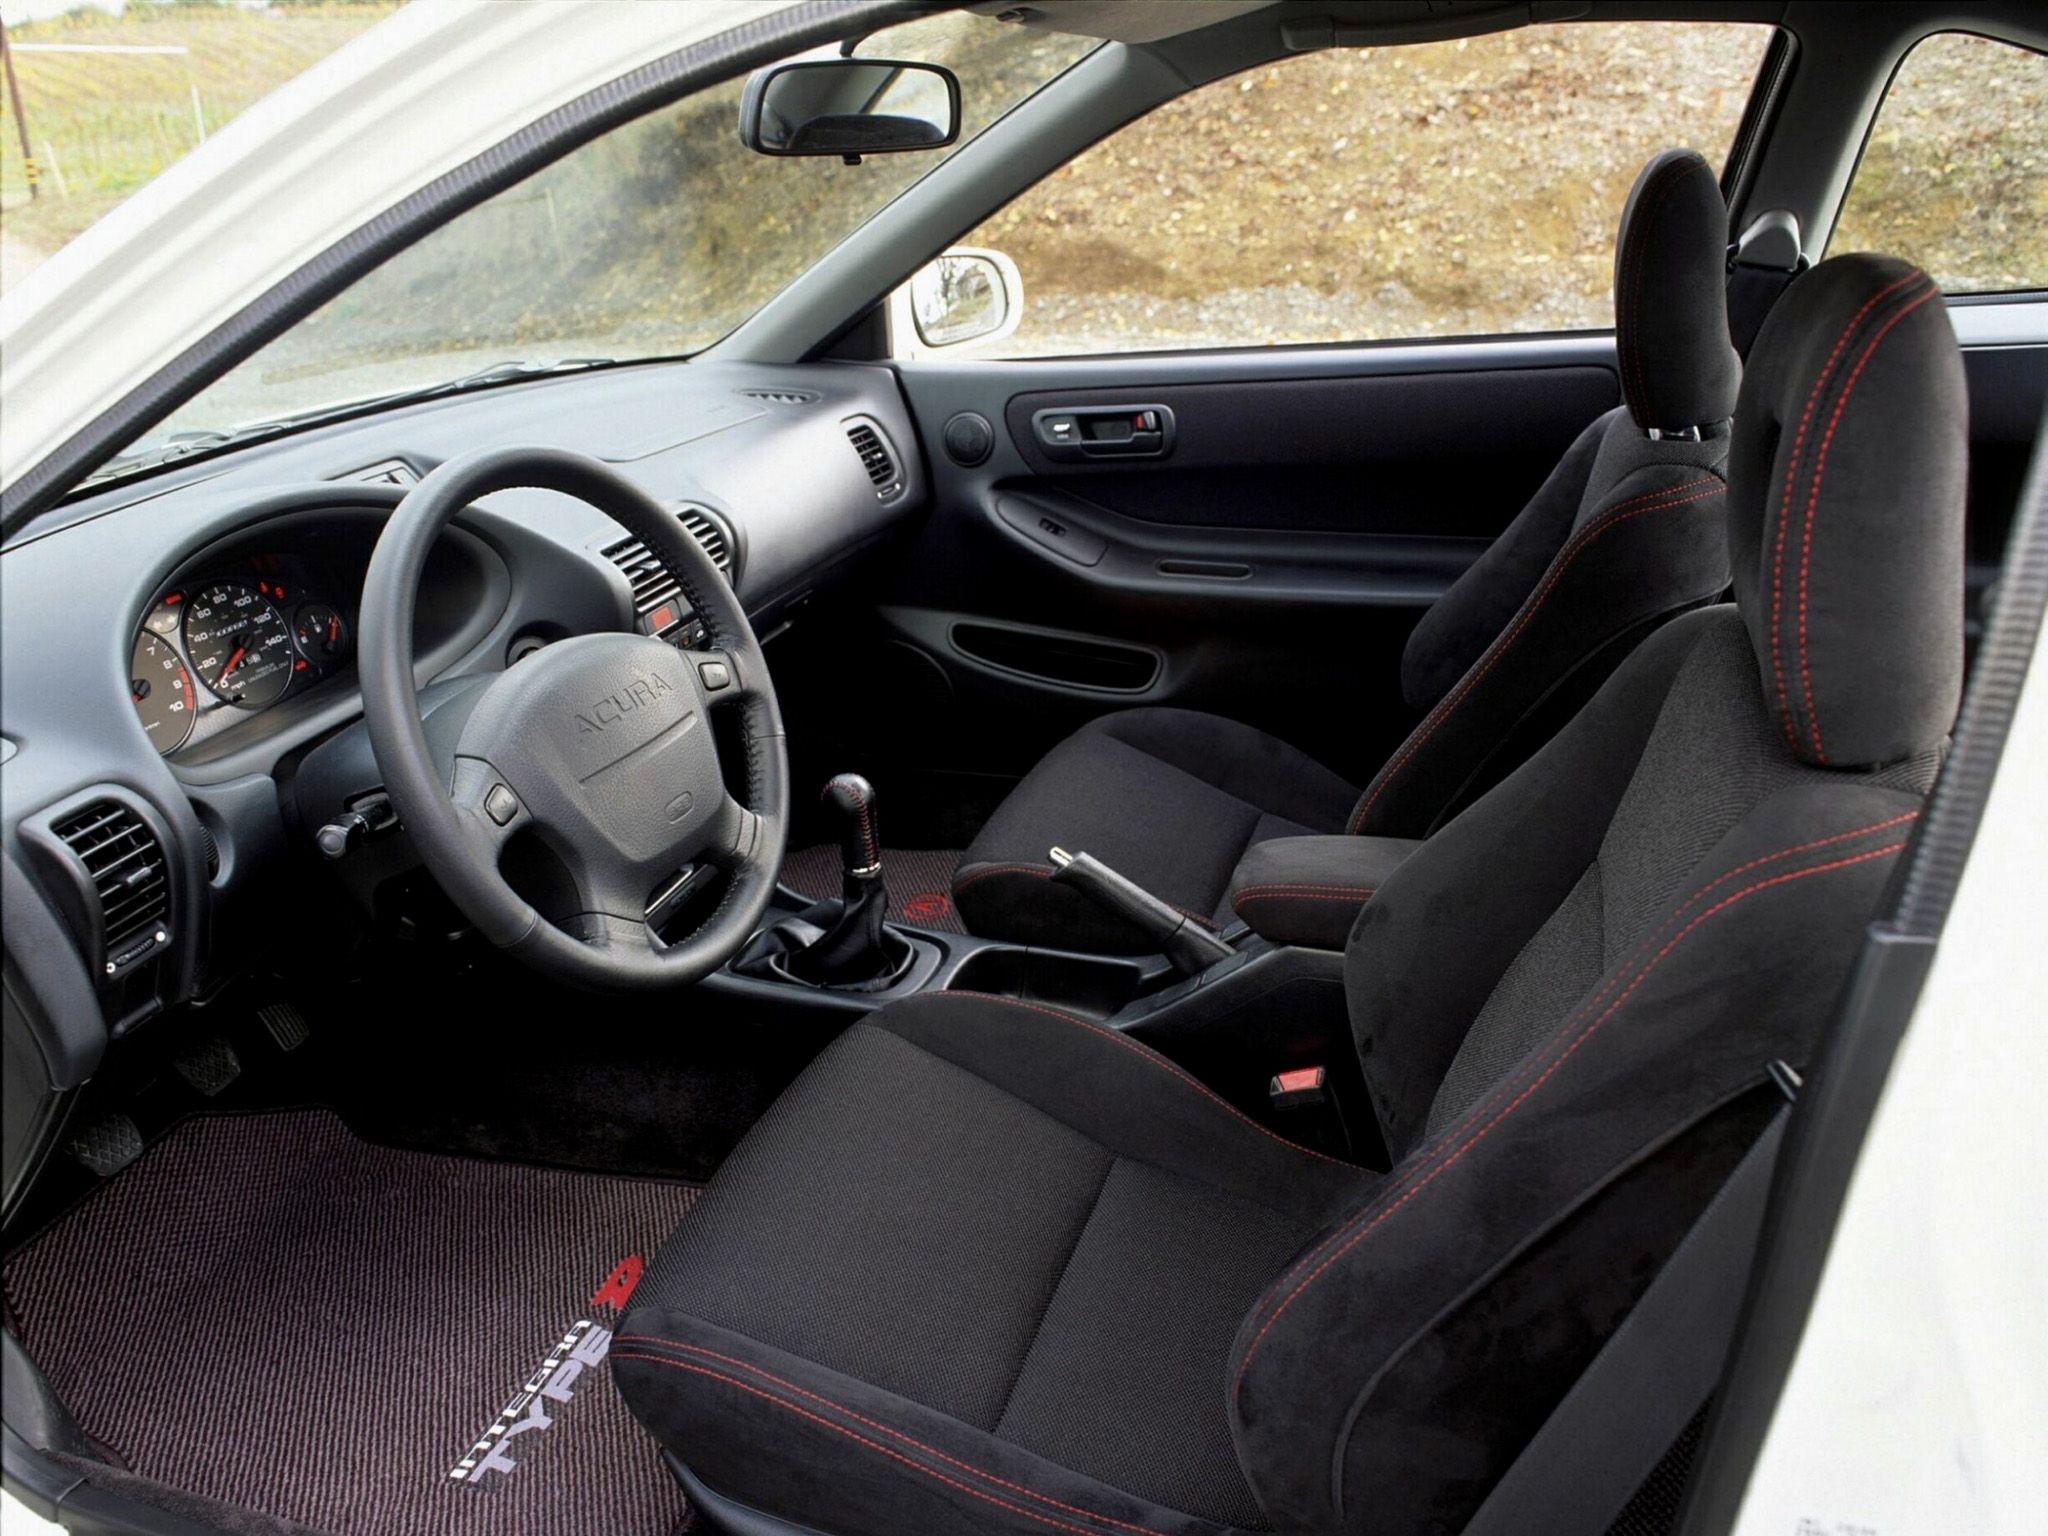 1998 Acura Integra Type R Nice Rides Honda Cars Automobile